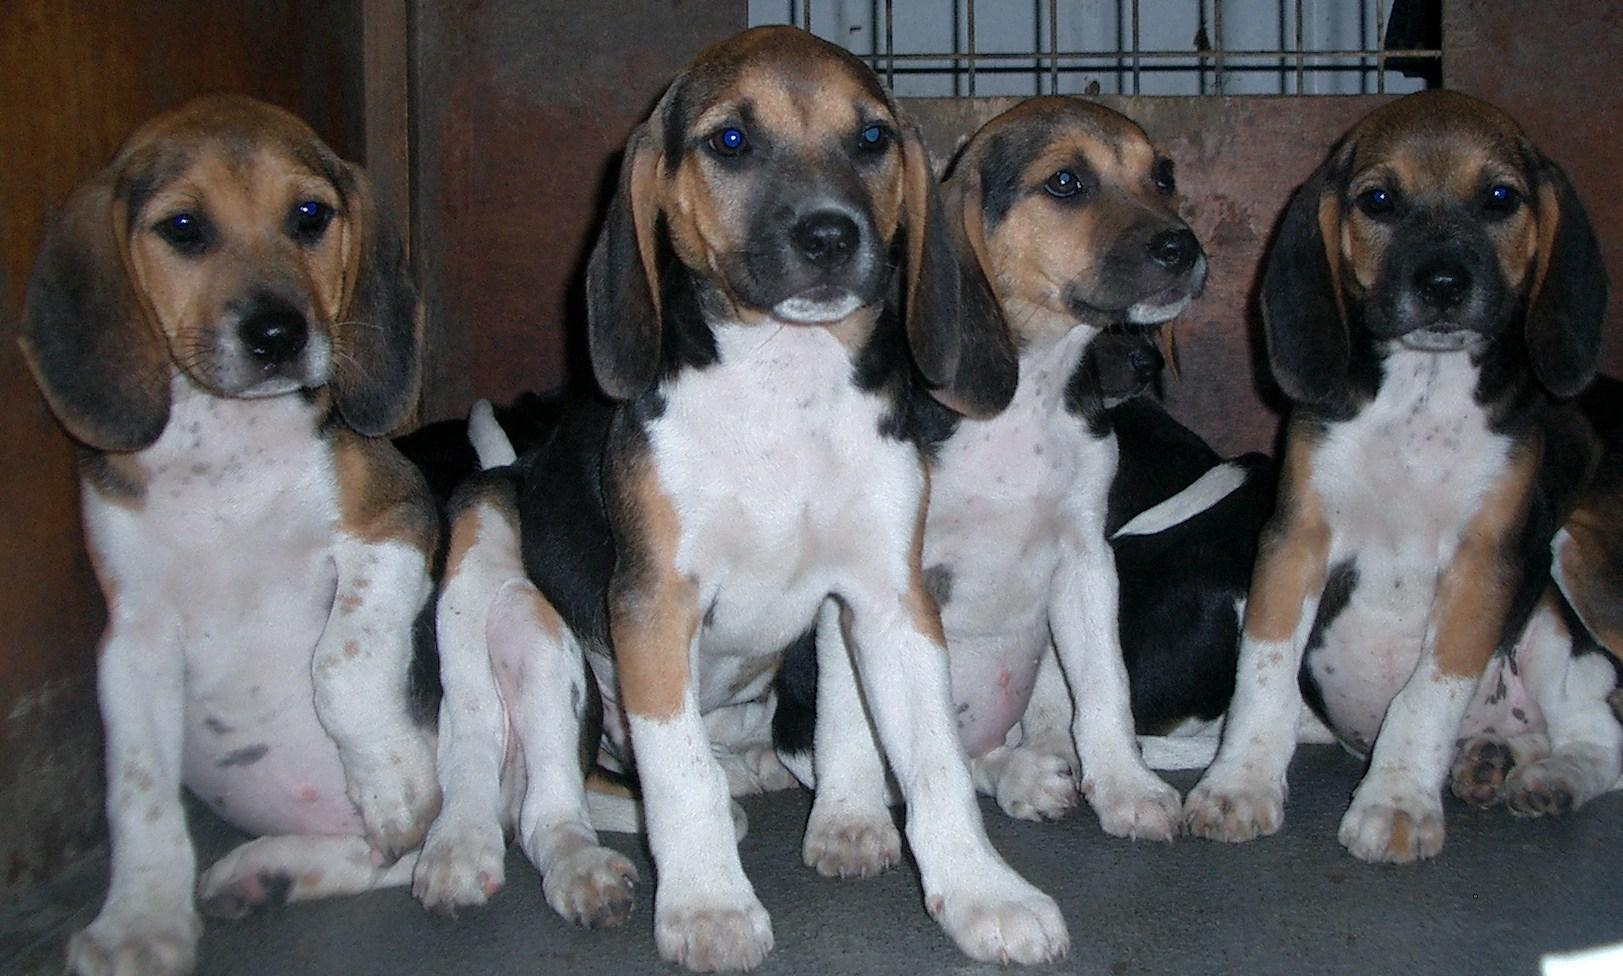 Four Beagle-Harrier dogs wallpaper